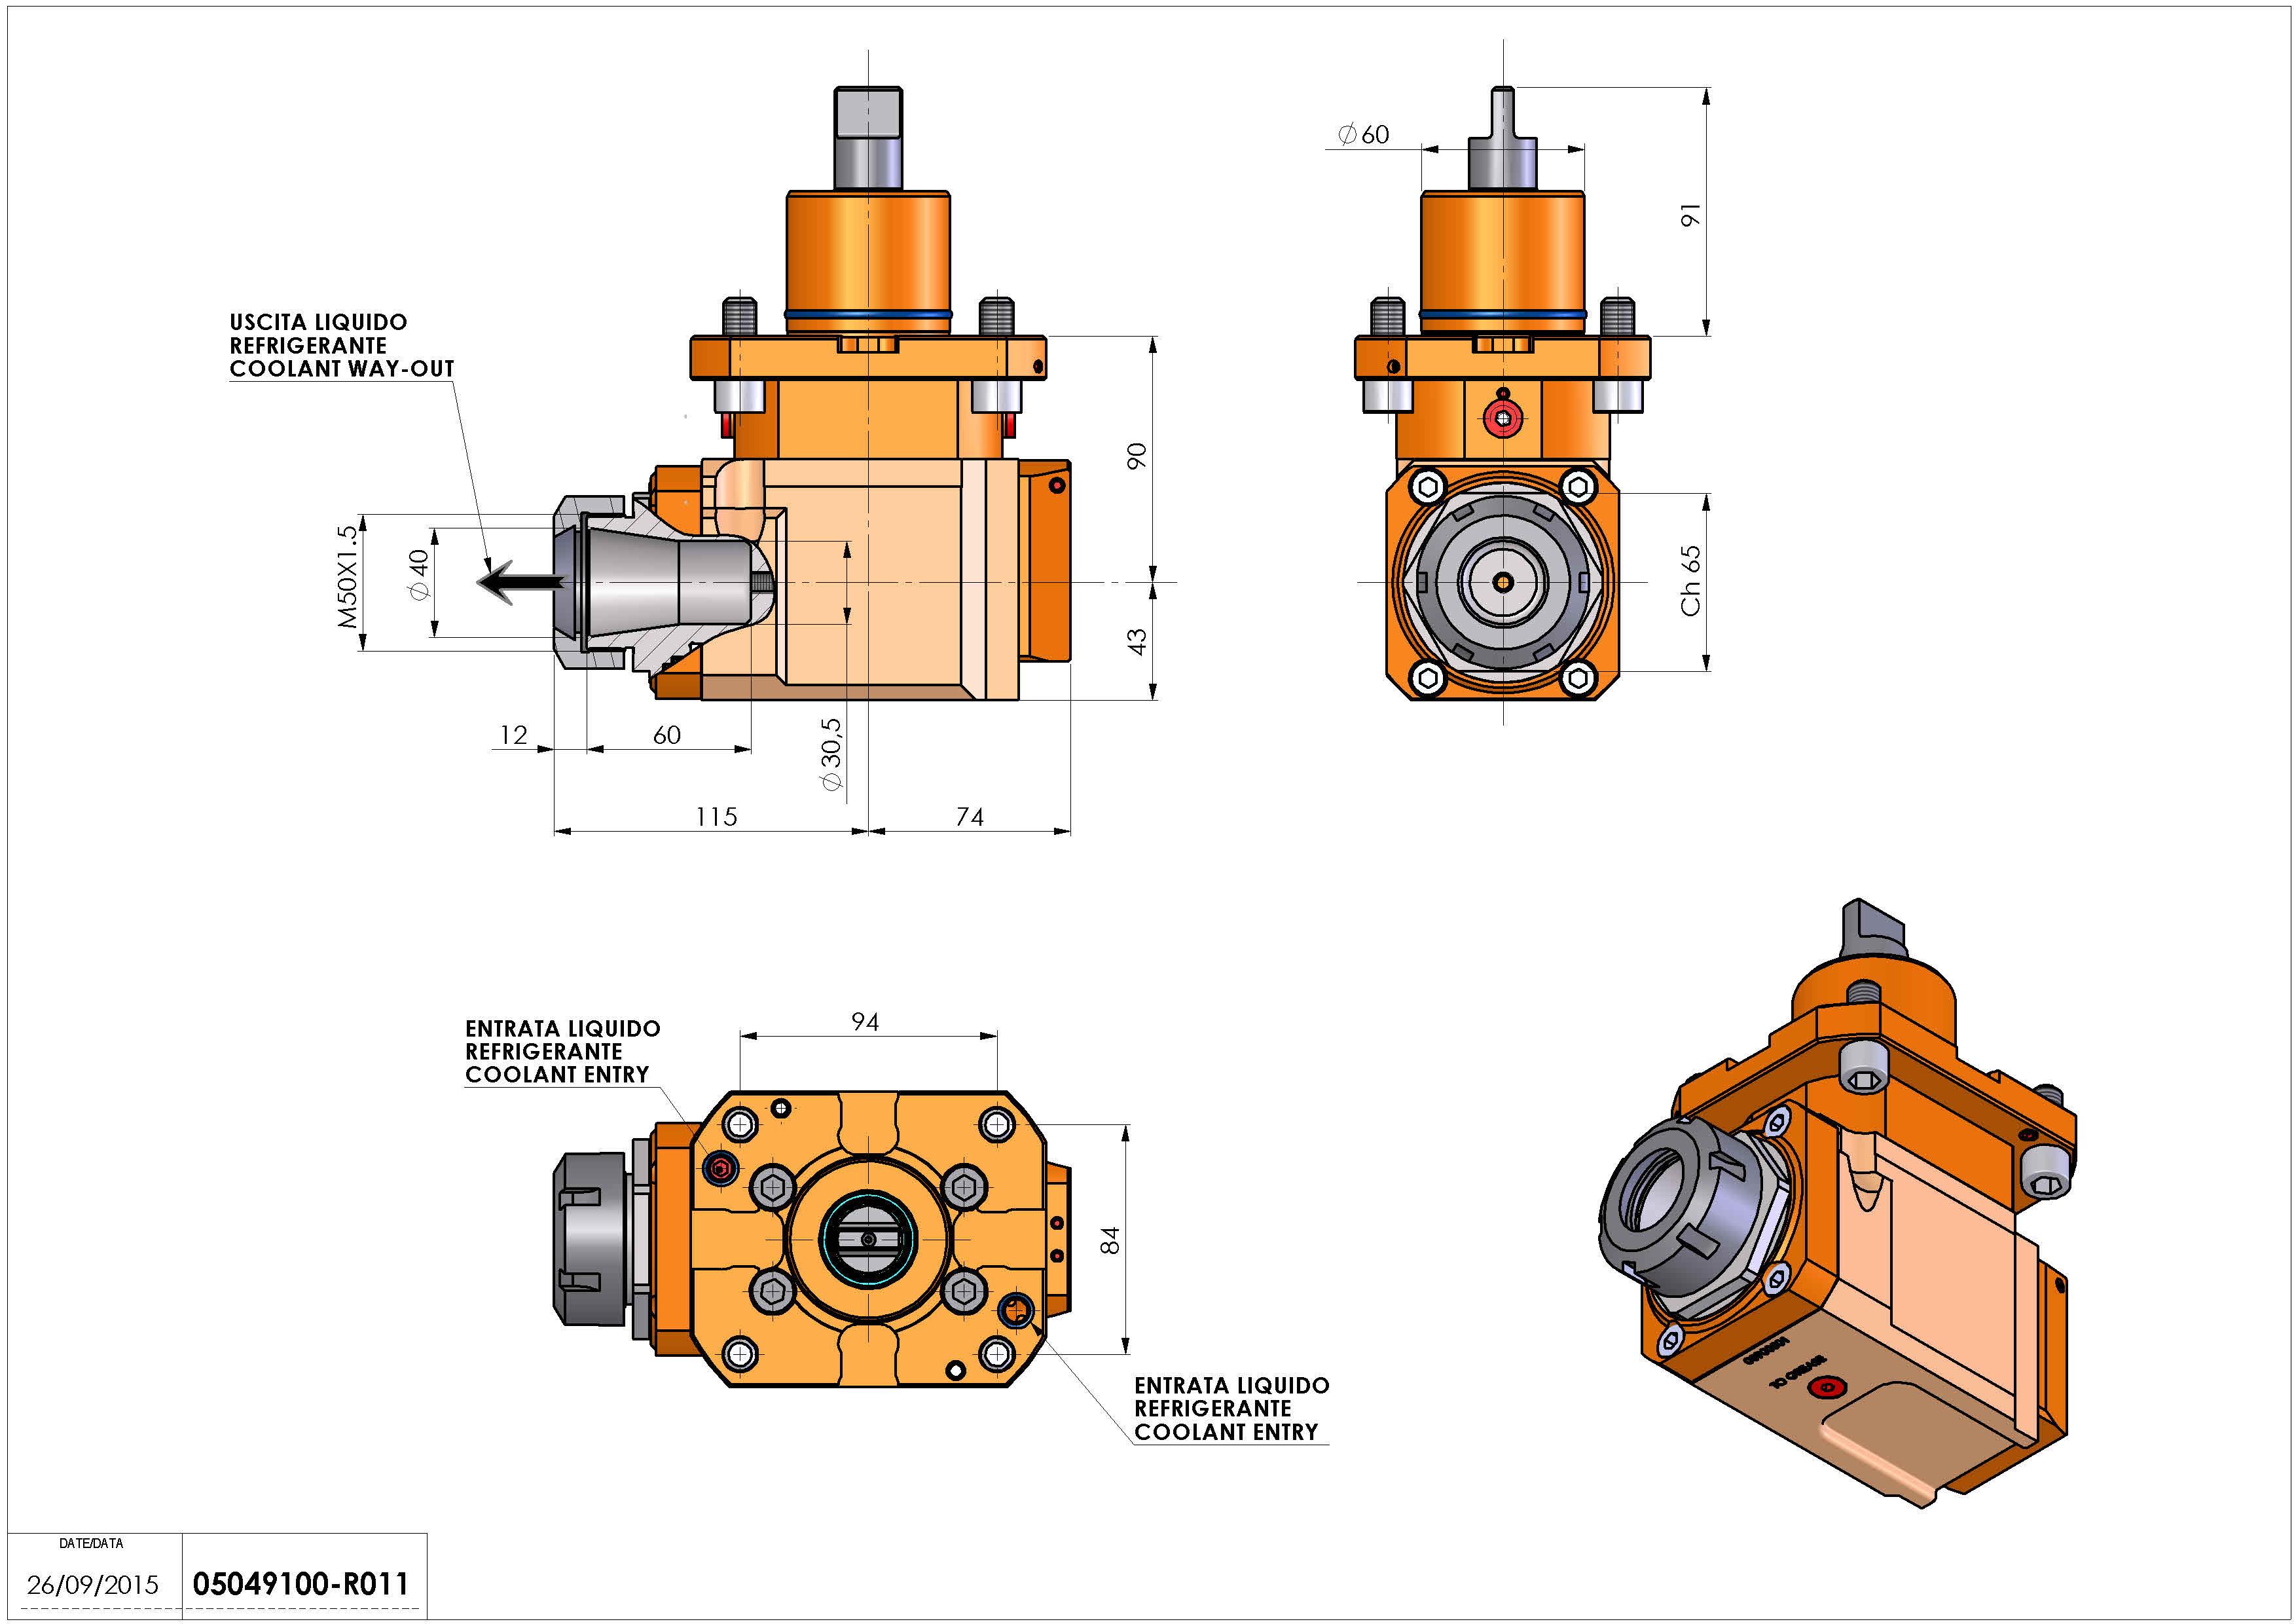 Technical image - LT-A D60 ER40 LR RF H90.